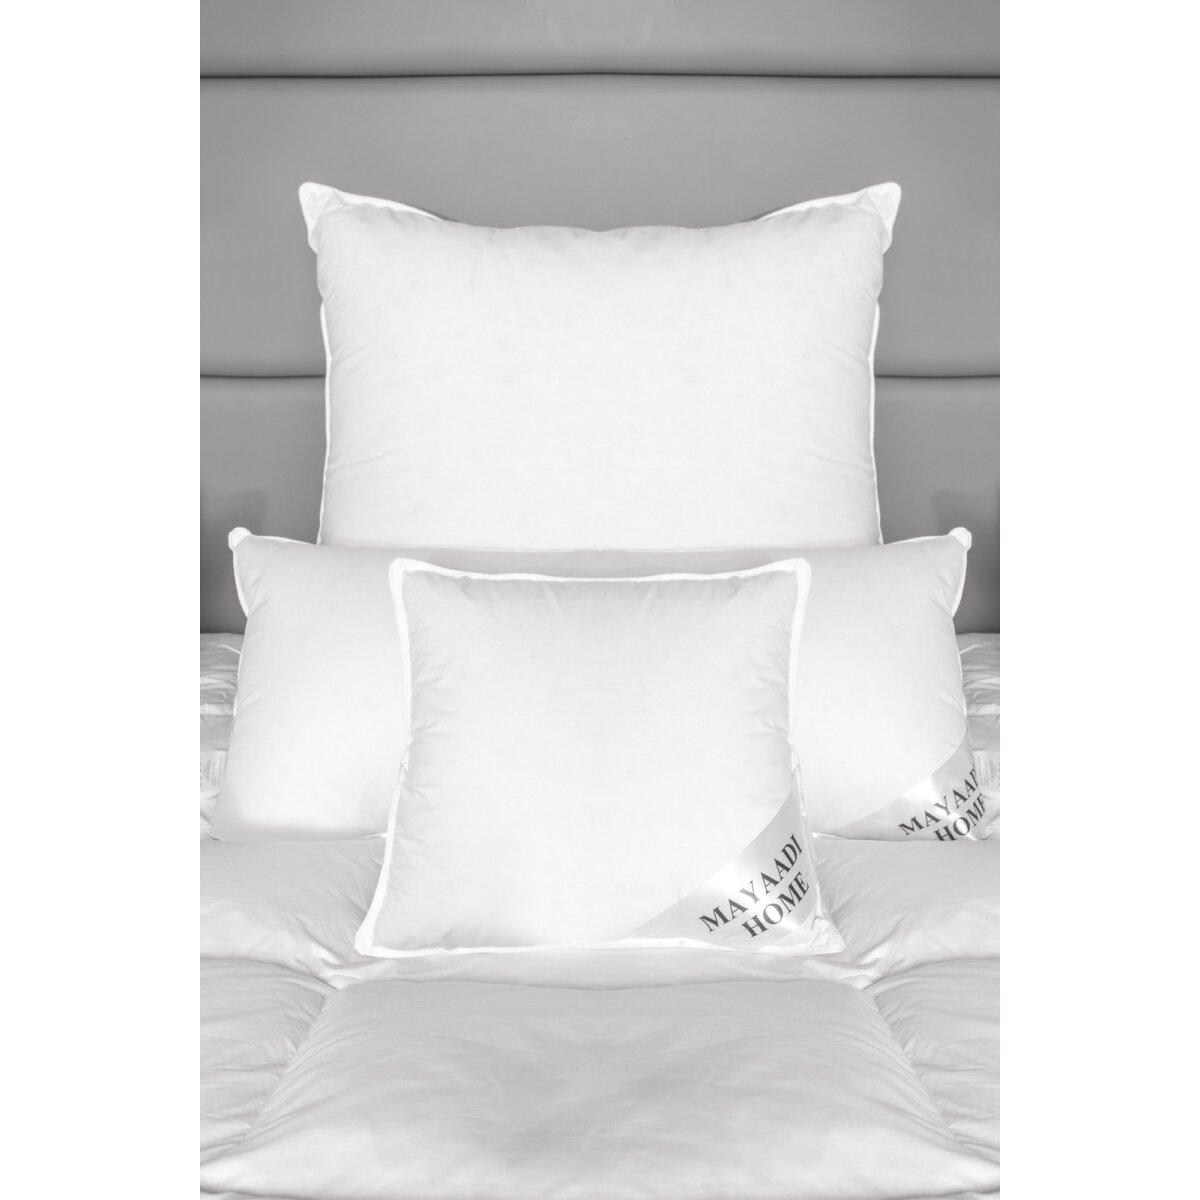 hs13 kopfkissen feder kissen 100 natur federnkissen daunen 80x80 cm 18 90. Black Bedroom Furniture Sets. Home Design Ideas